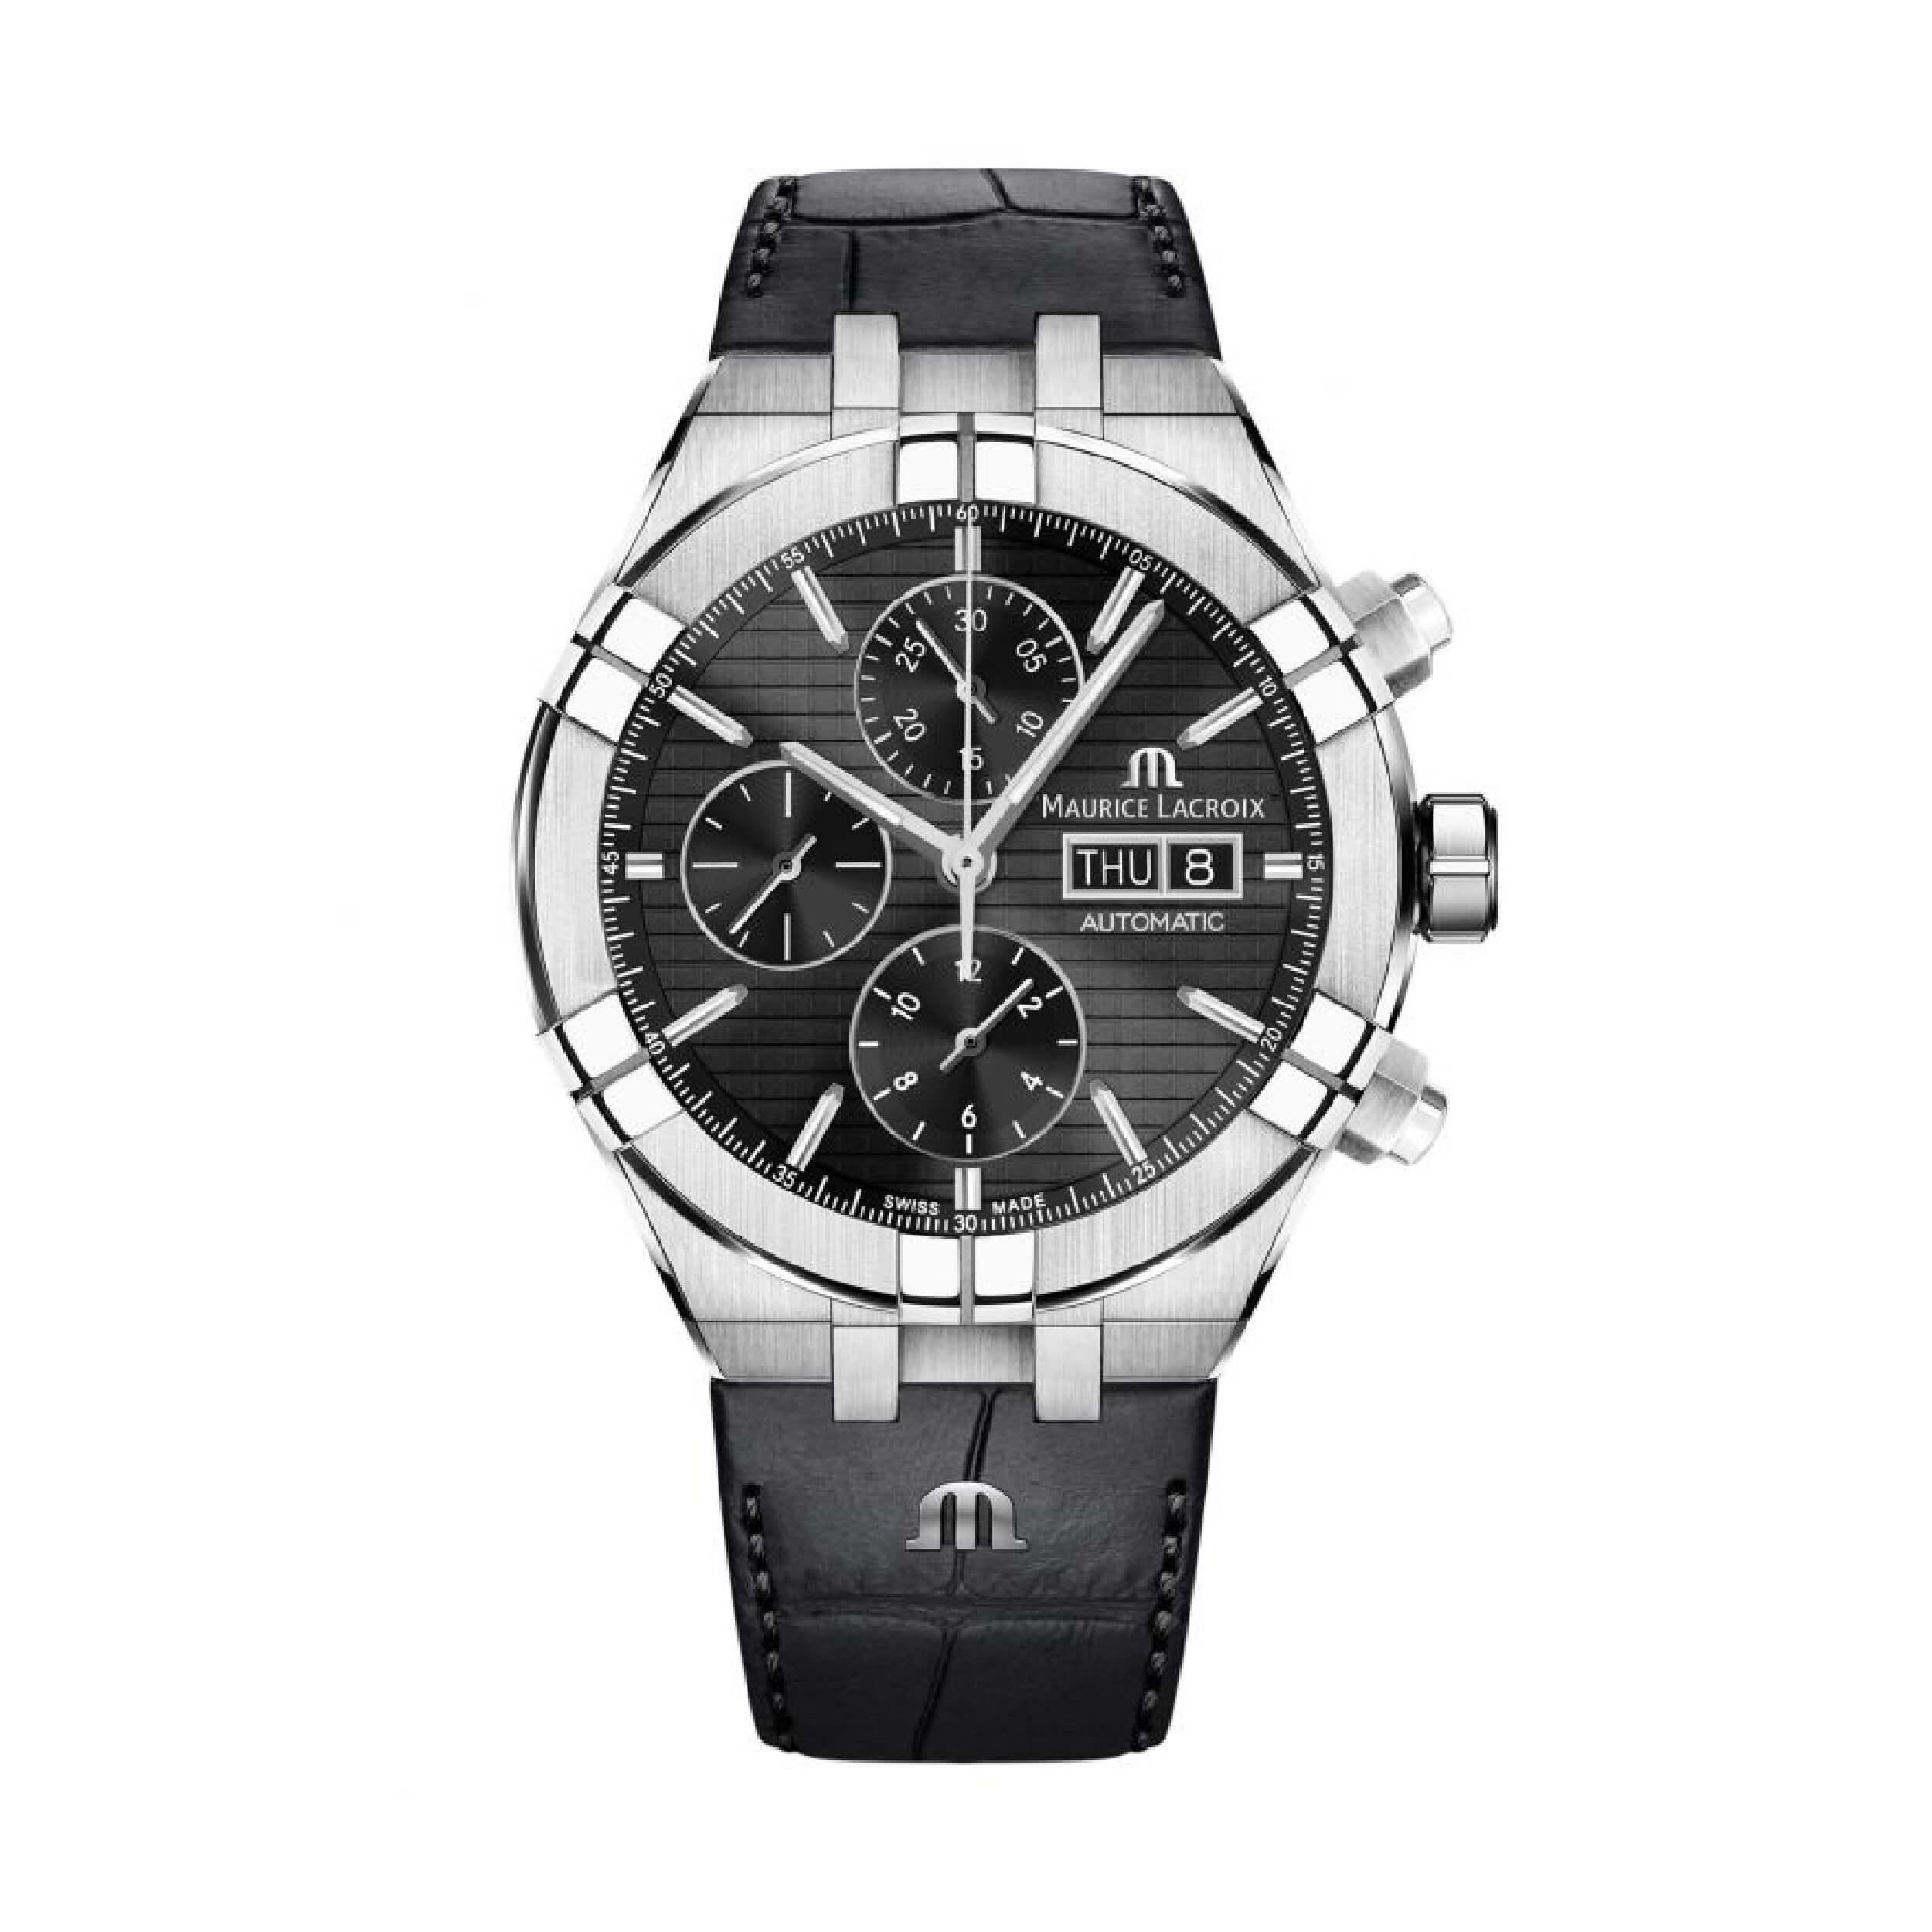 Maurice Lacroix Aikon Automatic Chronograph | Best Chronograph Watches Under 2000